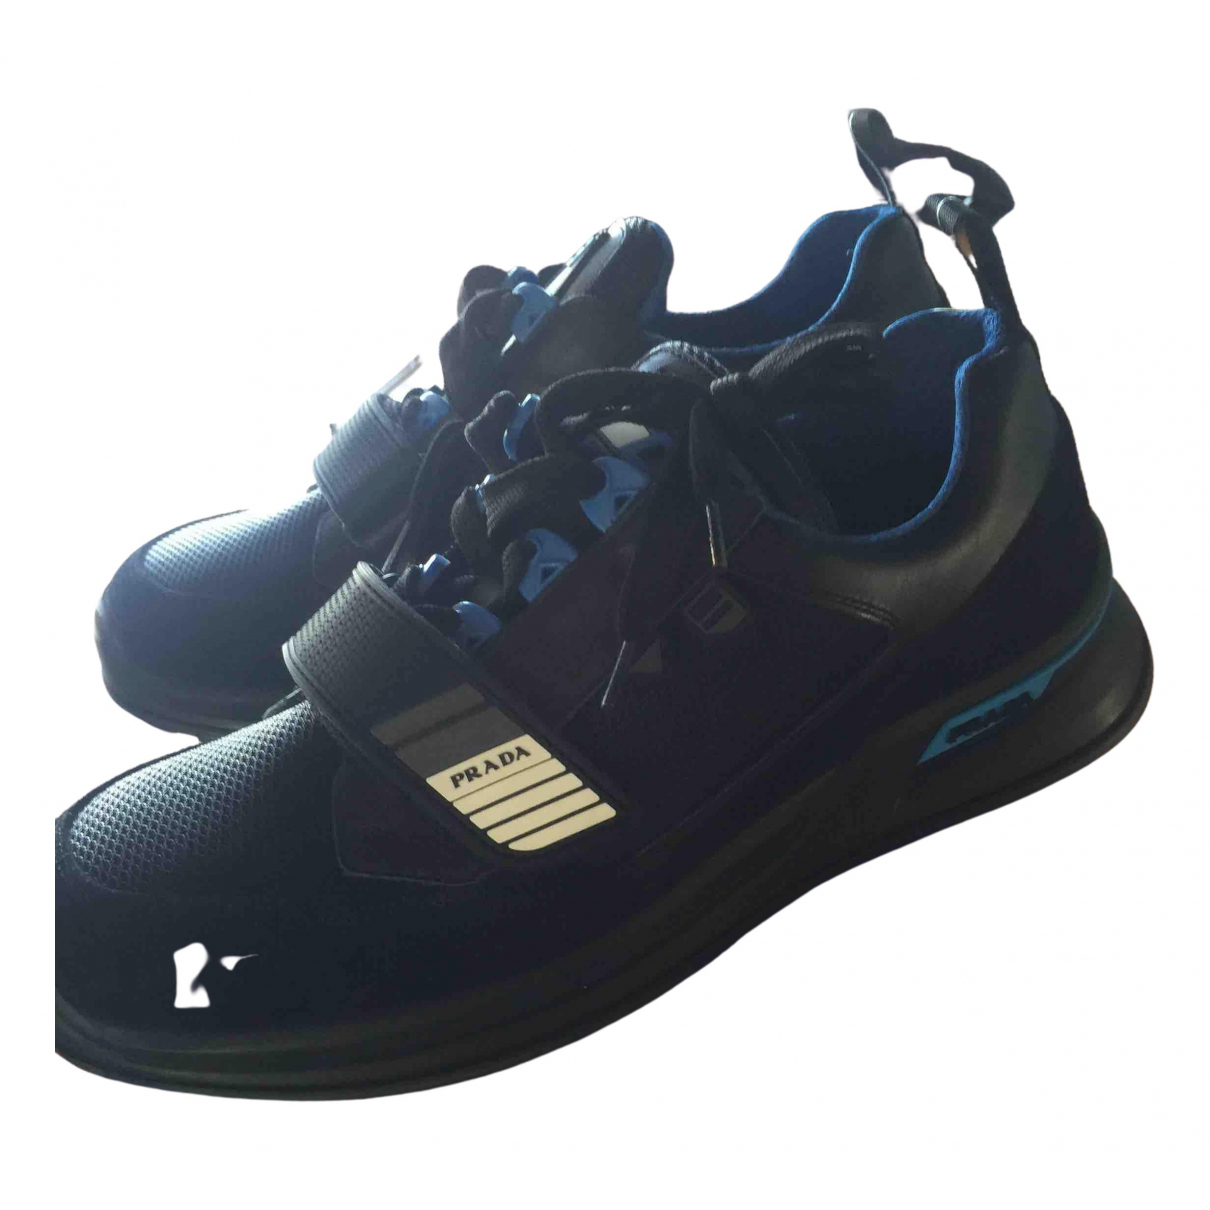 Prada - Baskets Mechano pour homme en cuir - noir